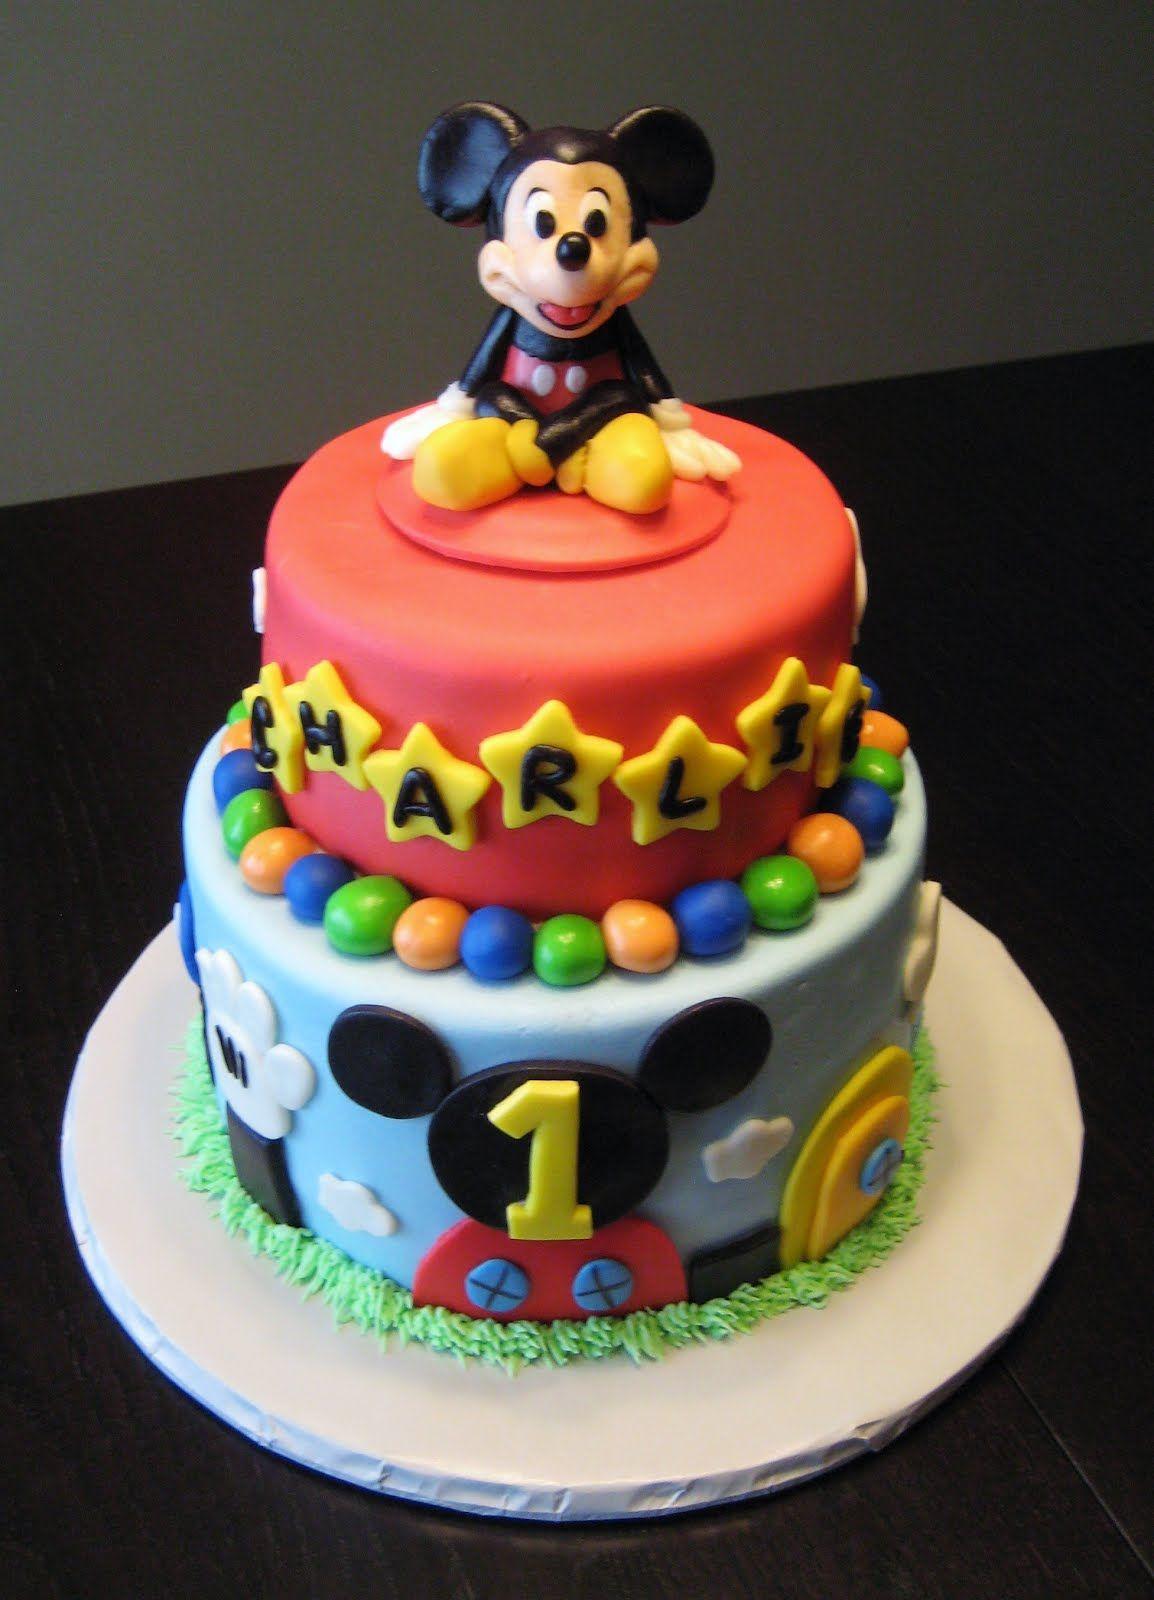 mickeymousdcakeideas Baby Mickey Mouse Cake Ideas Food